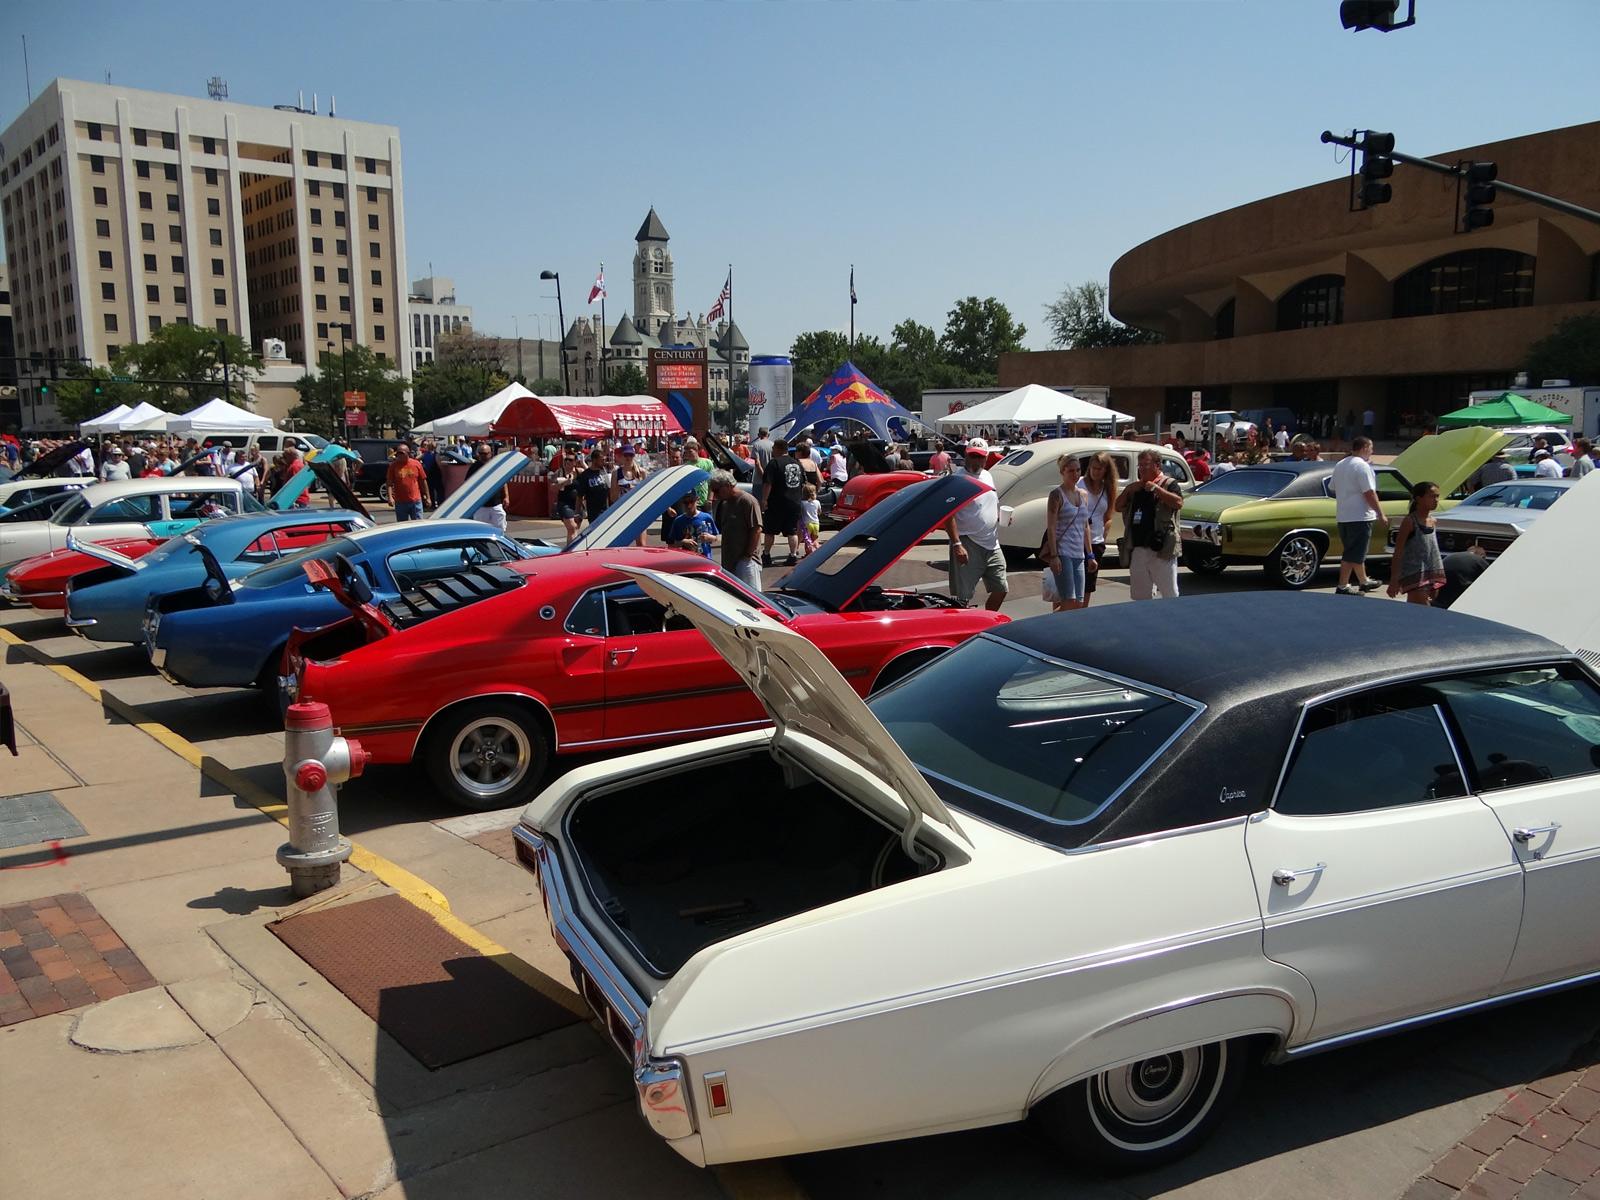 Blacktop Nationals Car Show In Wichita Ks